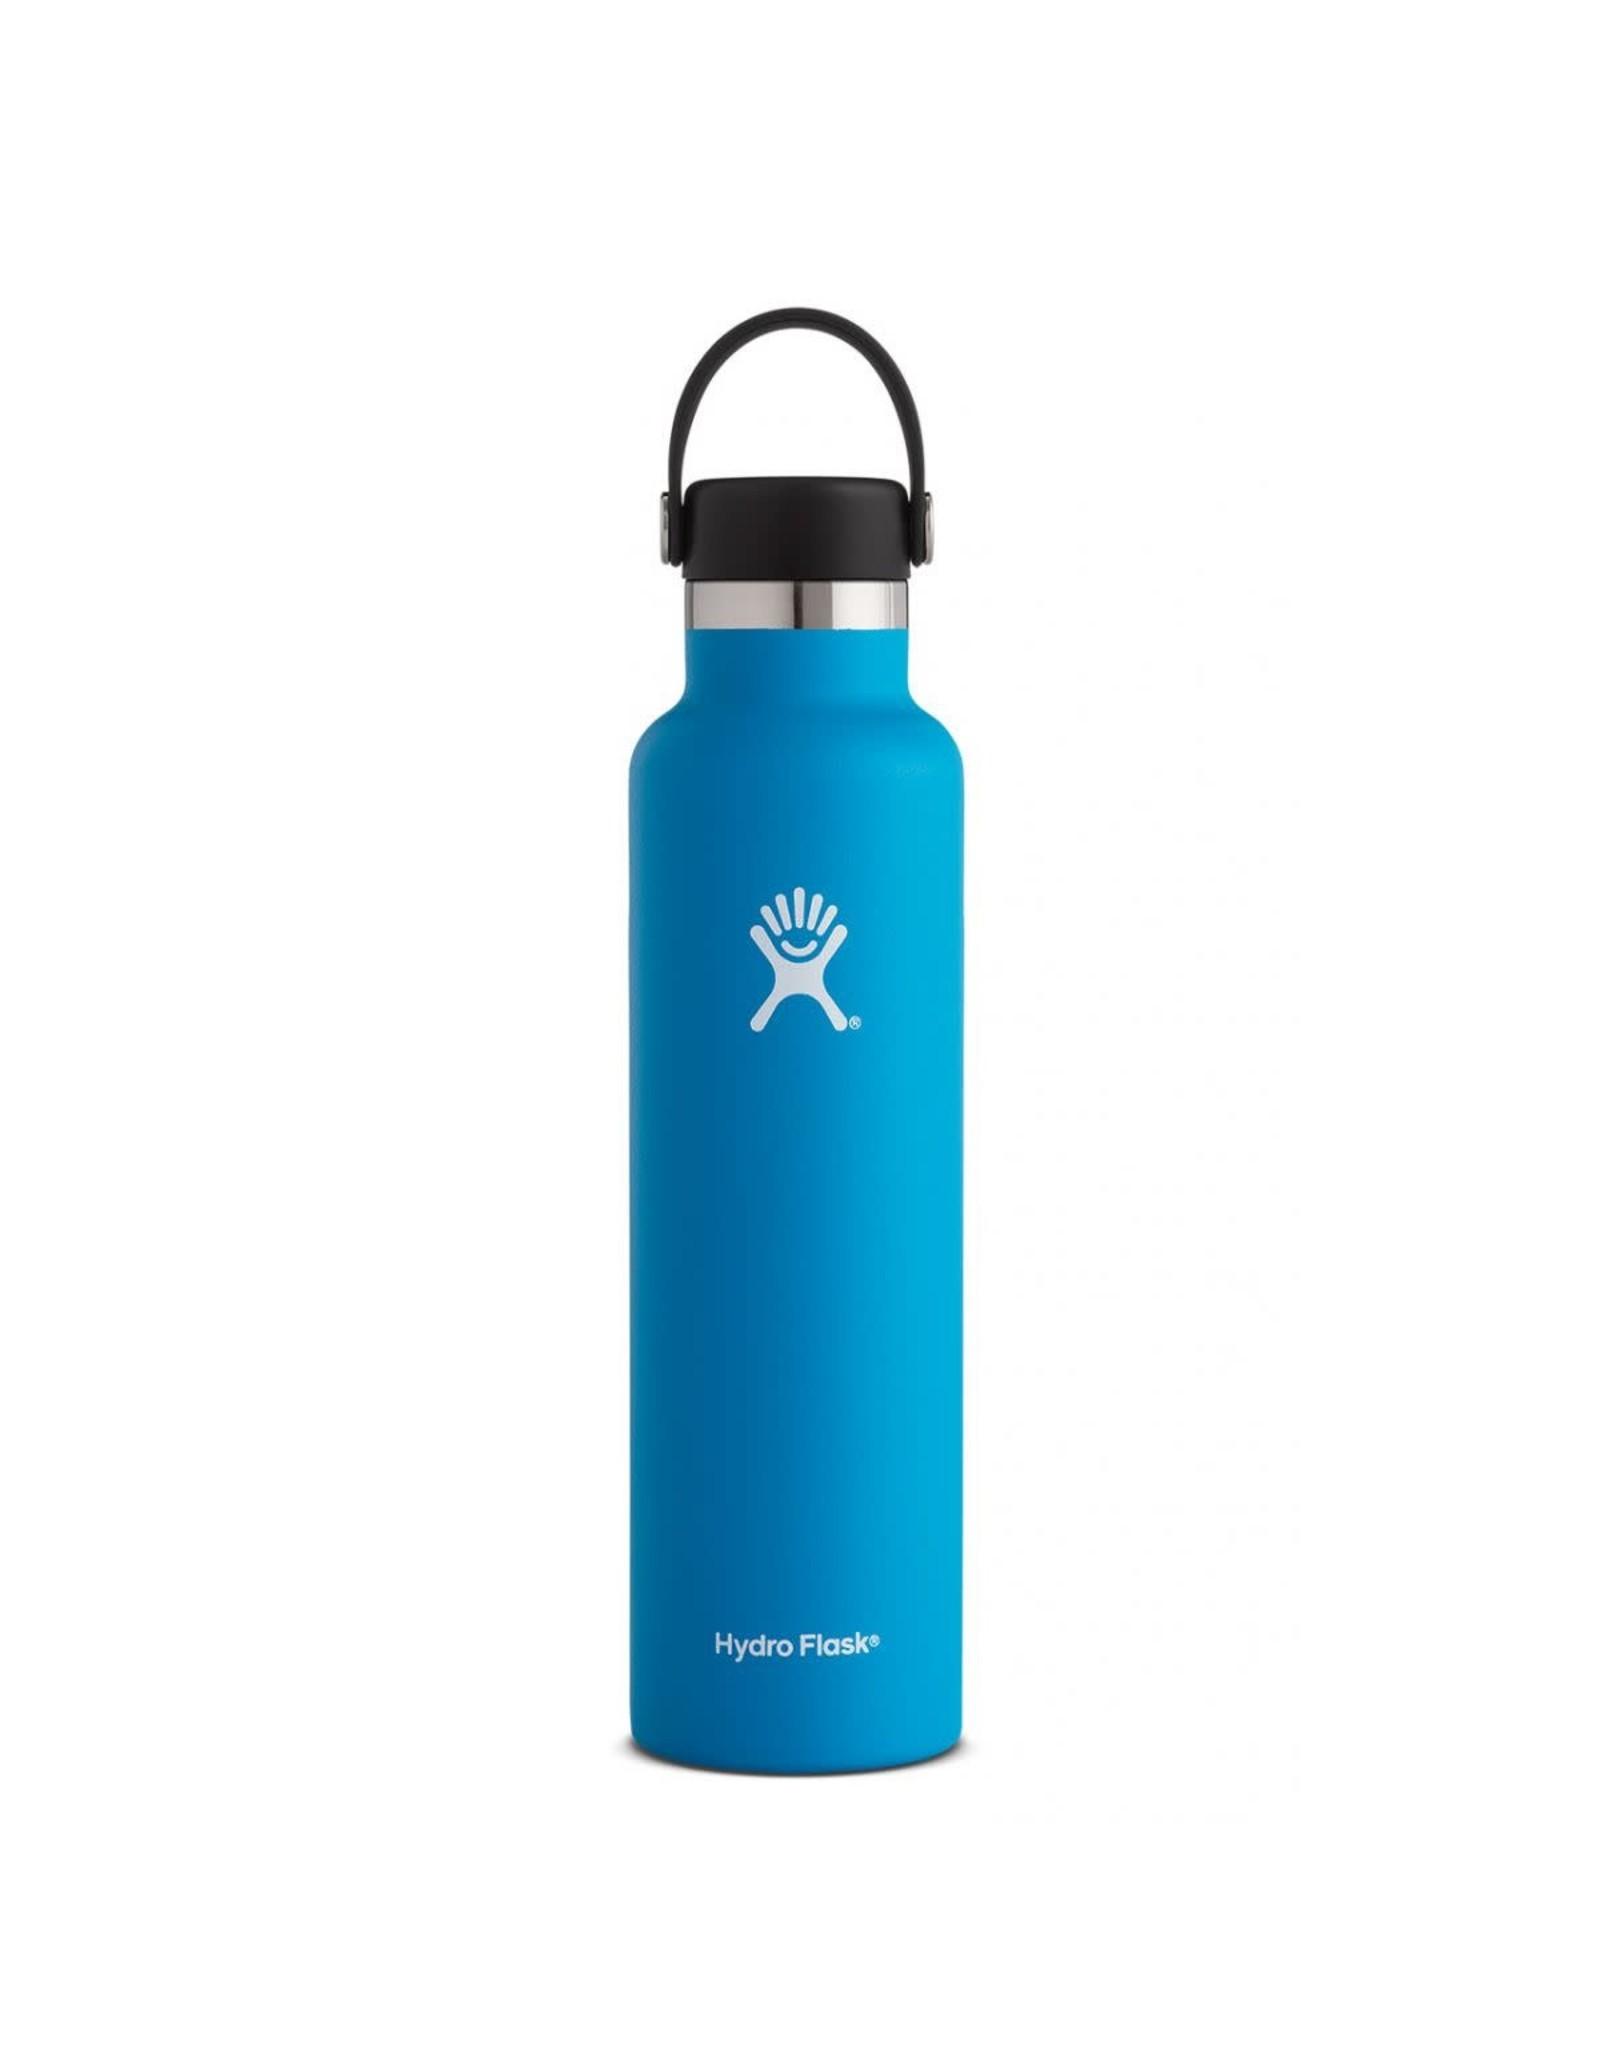 Hydro Flask Hydro Flask 24oz Standard Mouth w/ Flex Cap Pacific